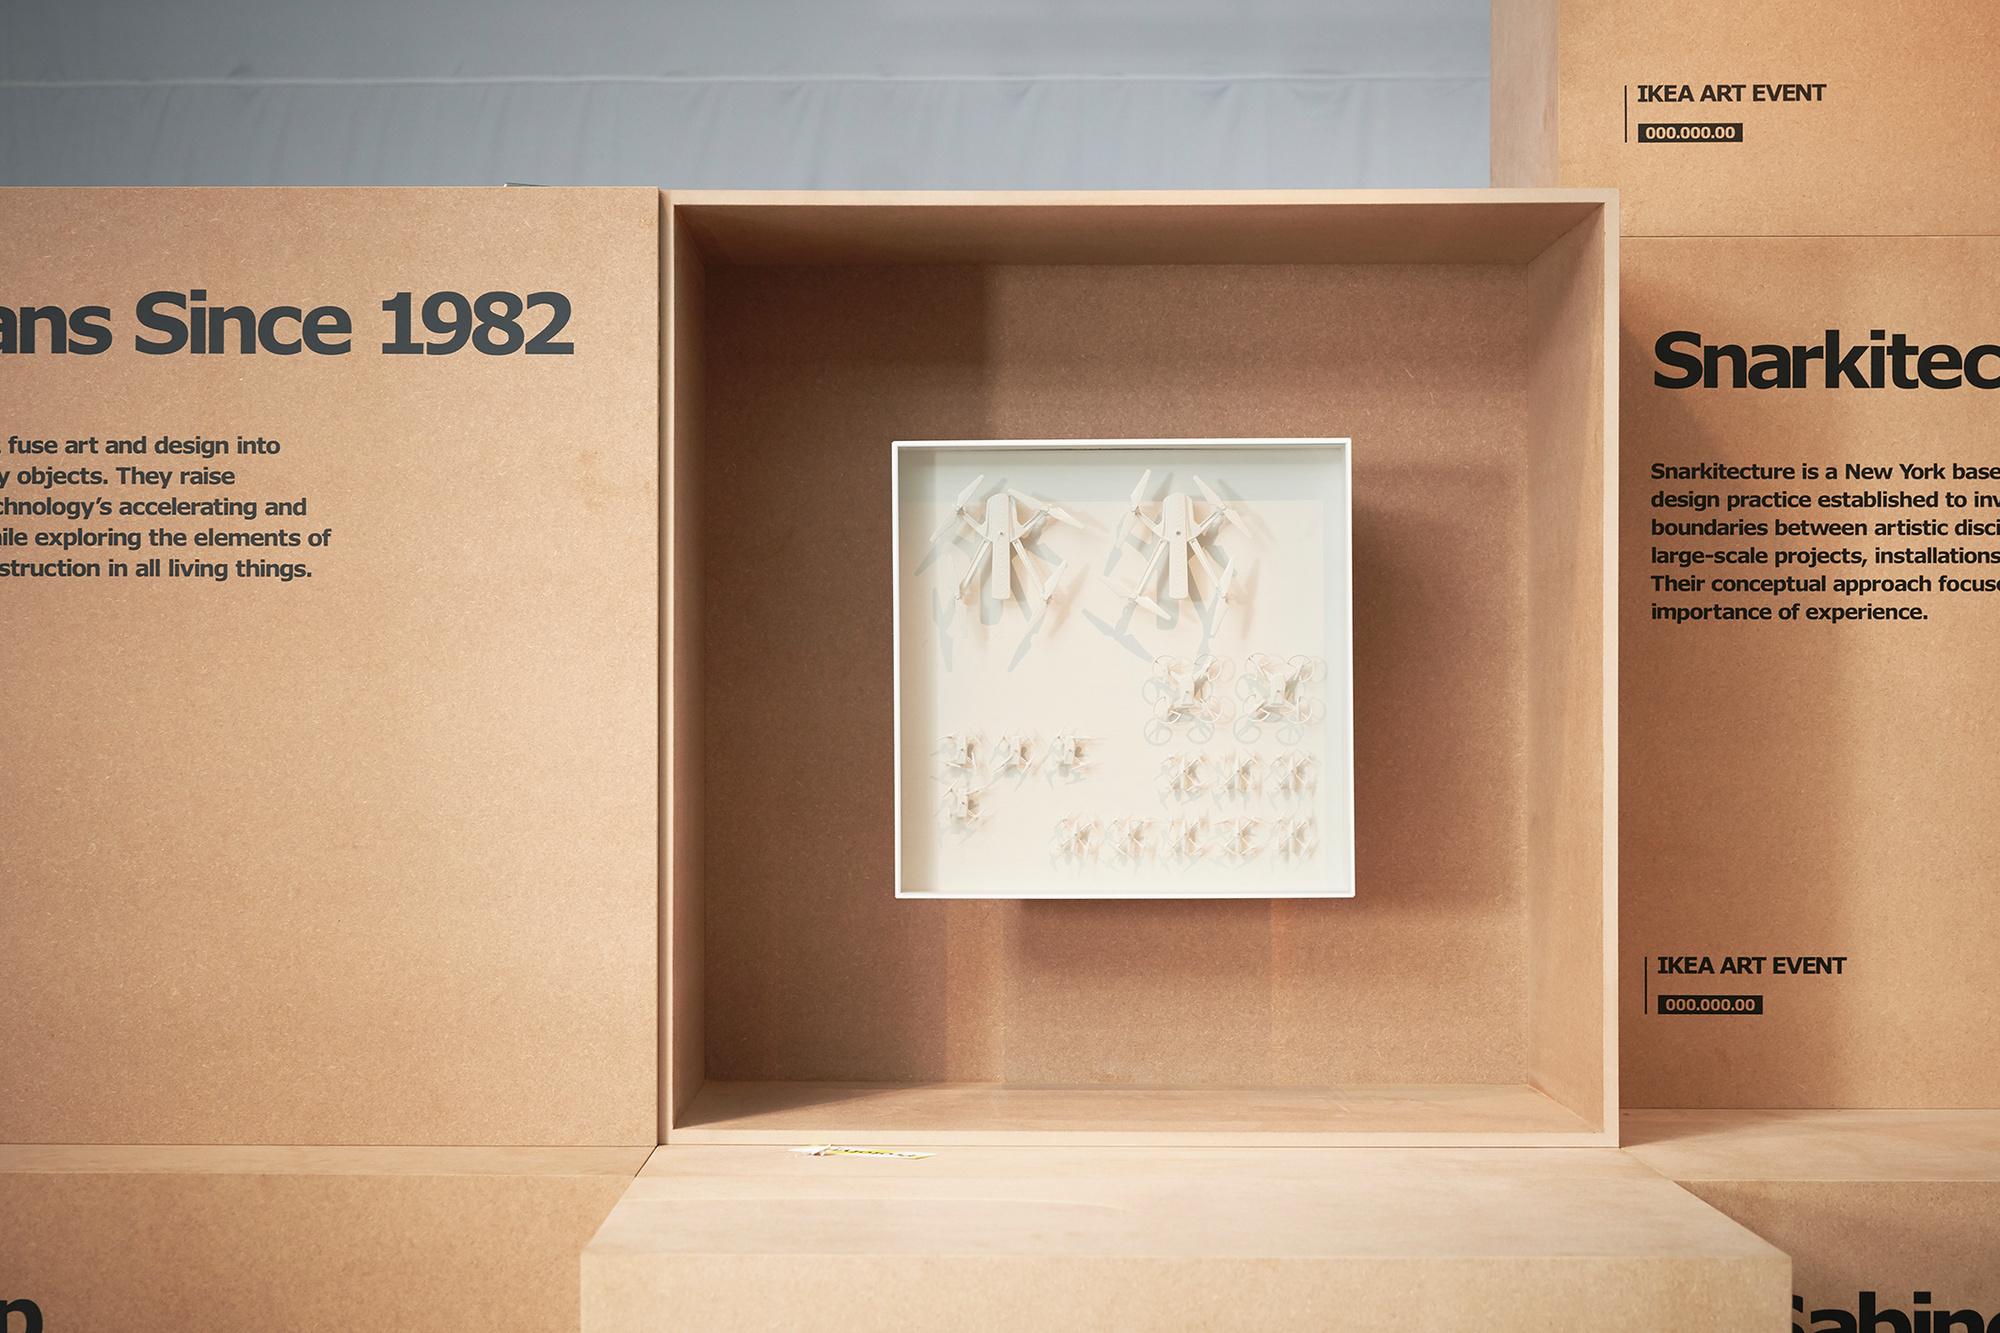 Art Event, Ikea